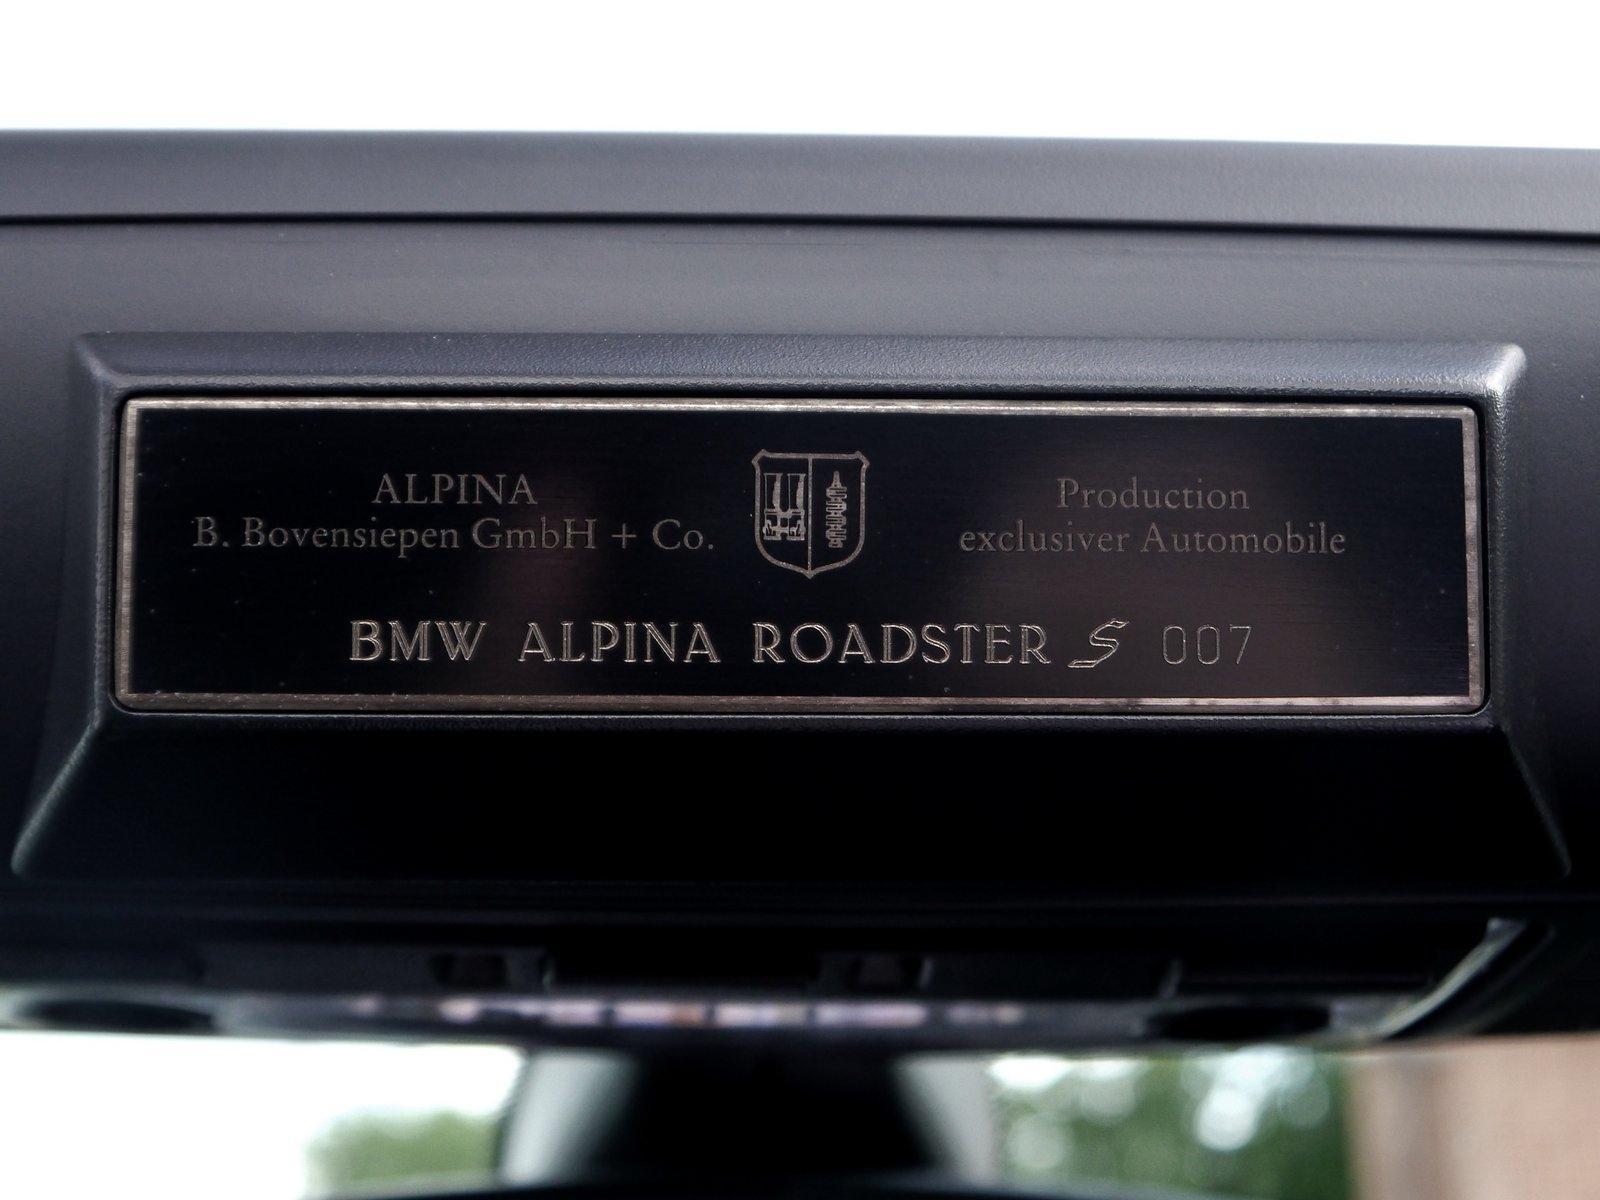 BMWALPINA ROADSTER 3.4 S LUX - RARE VEHICLE - BMW FSH #14